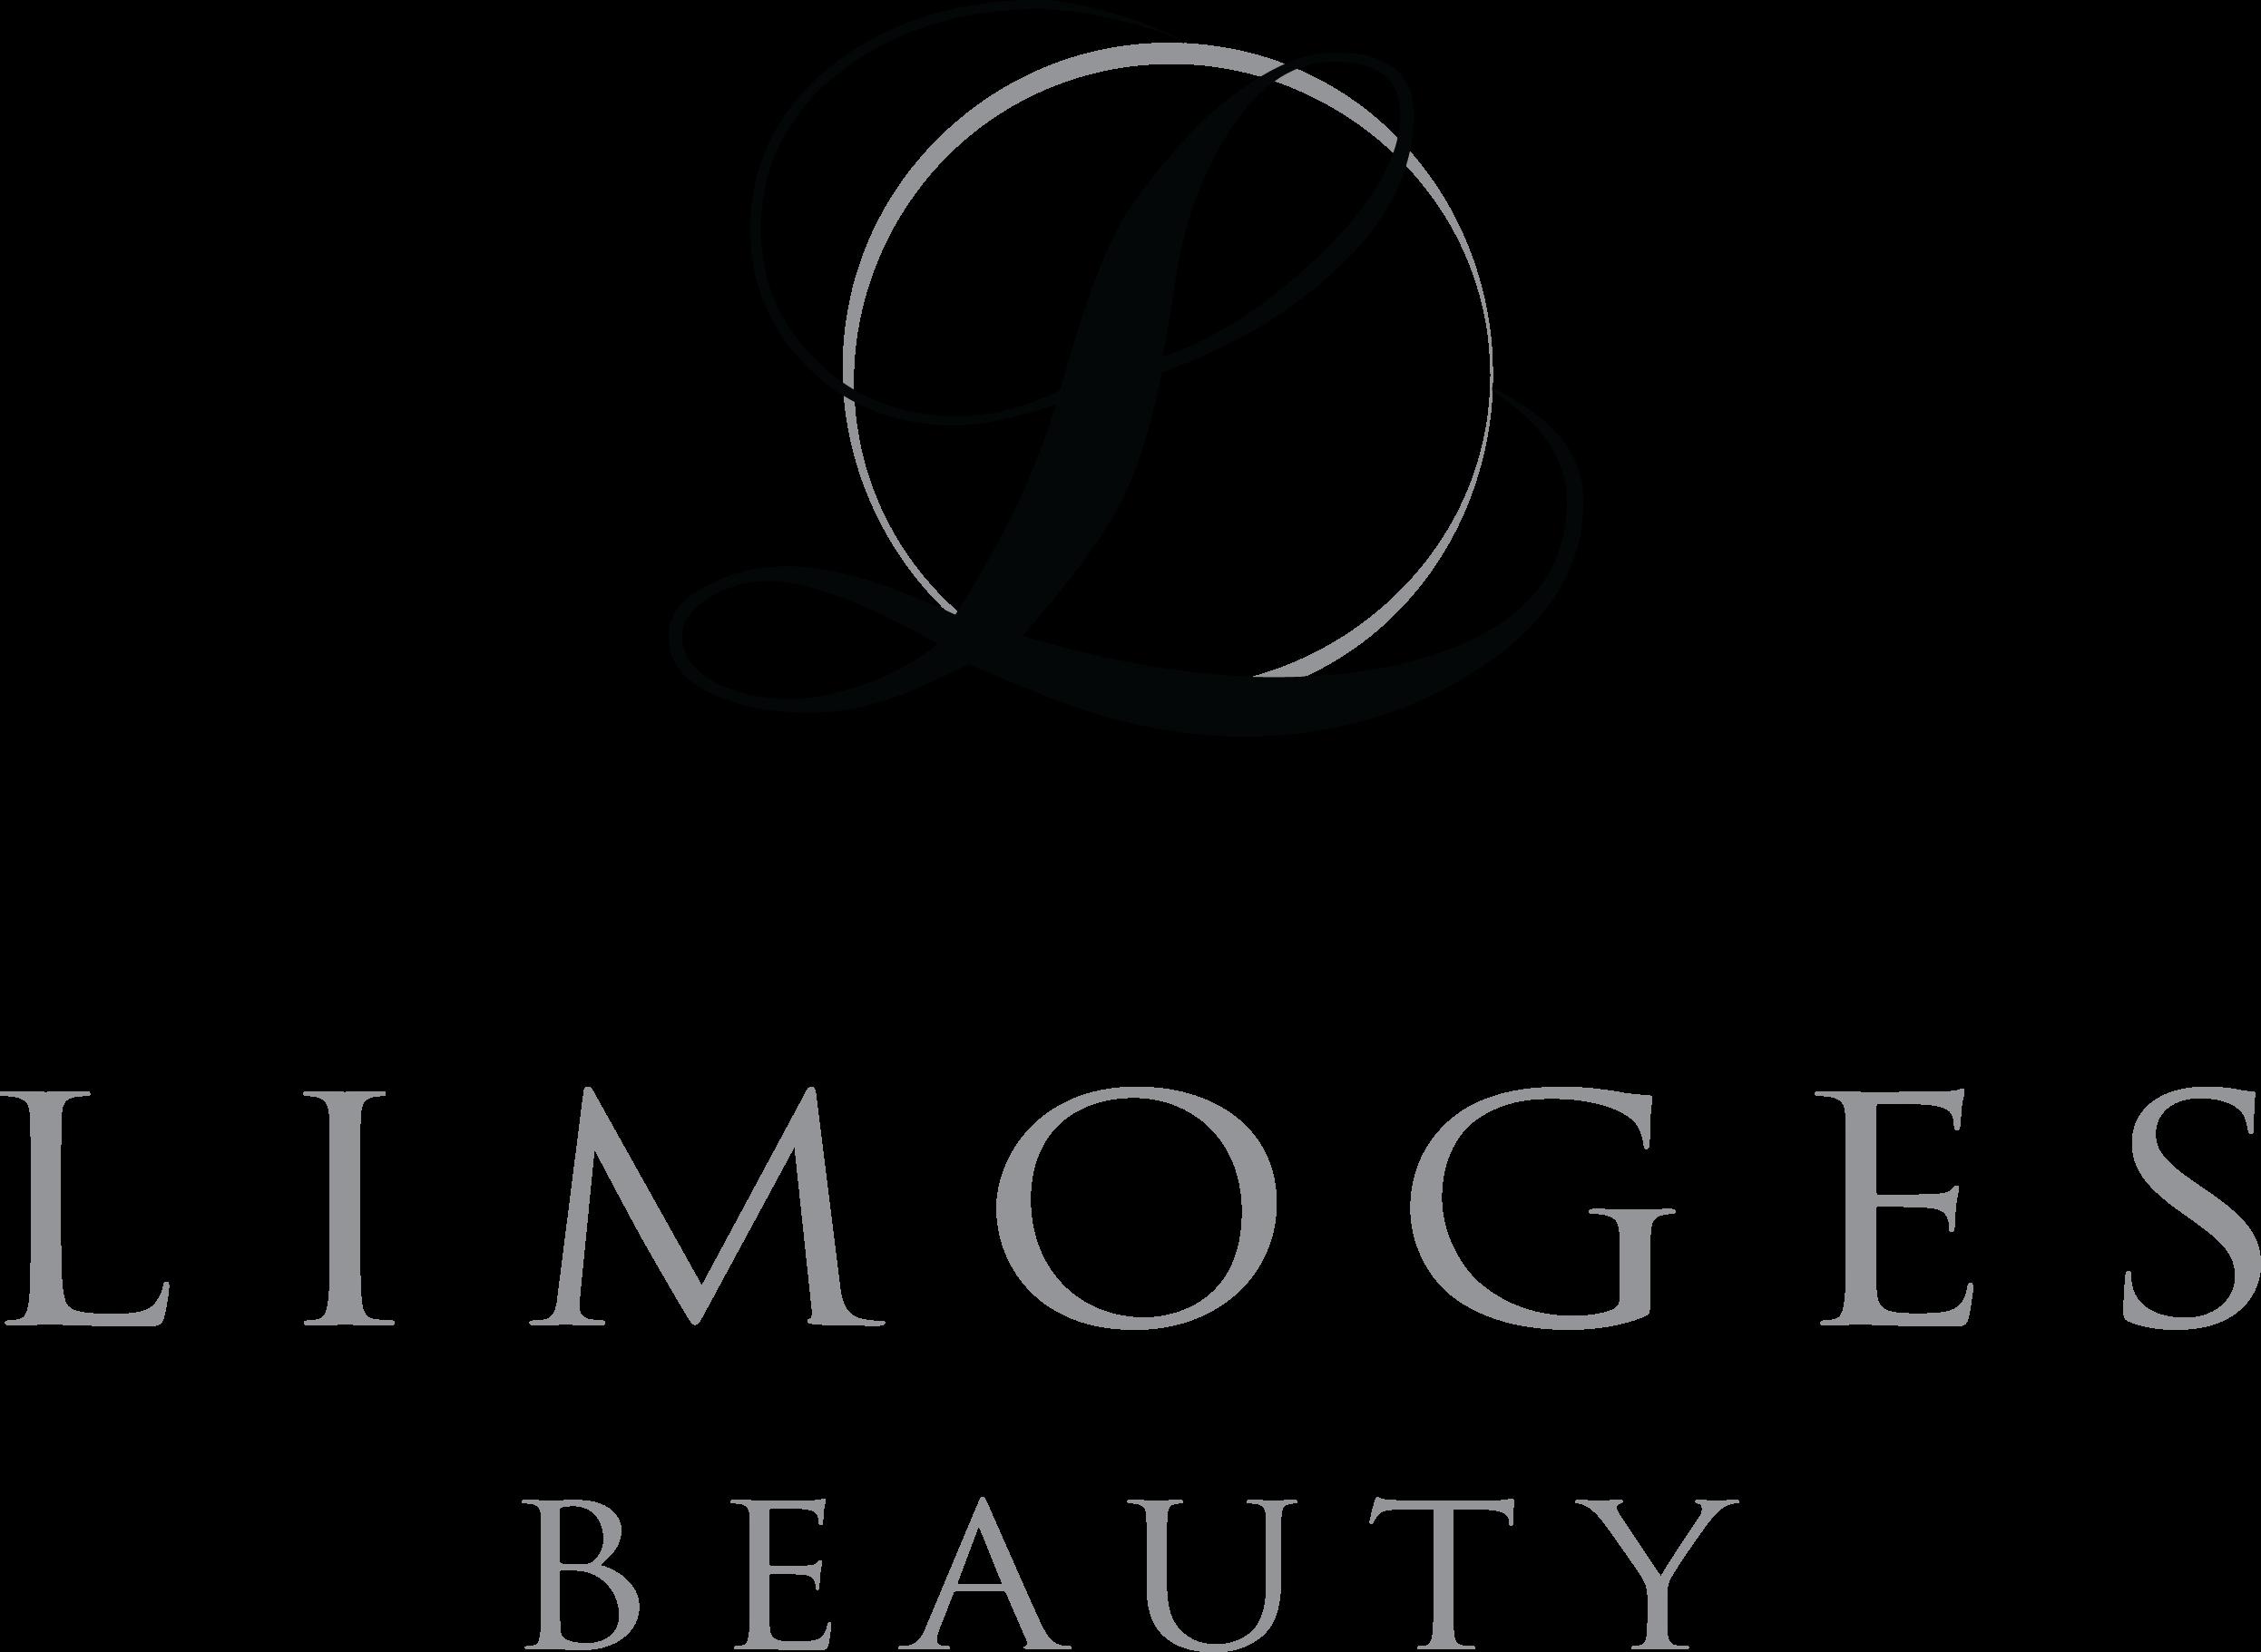 Limoges Beauty Skincare & Electrolysis image